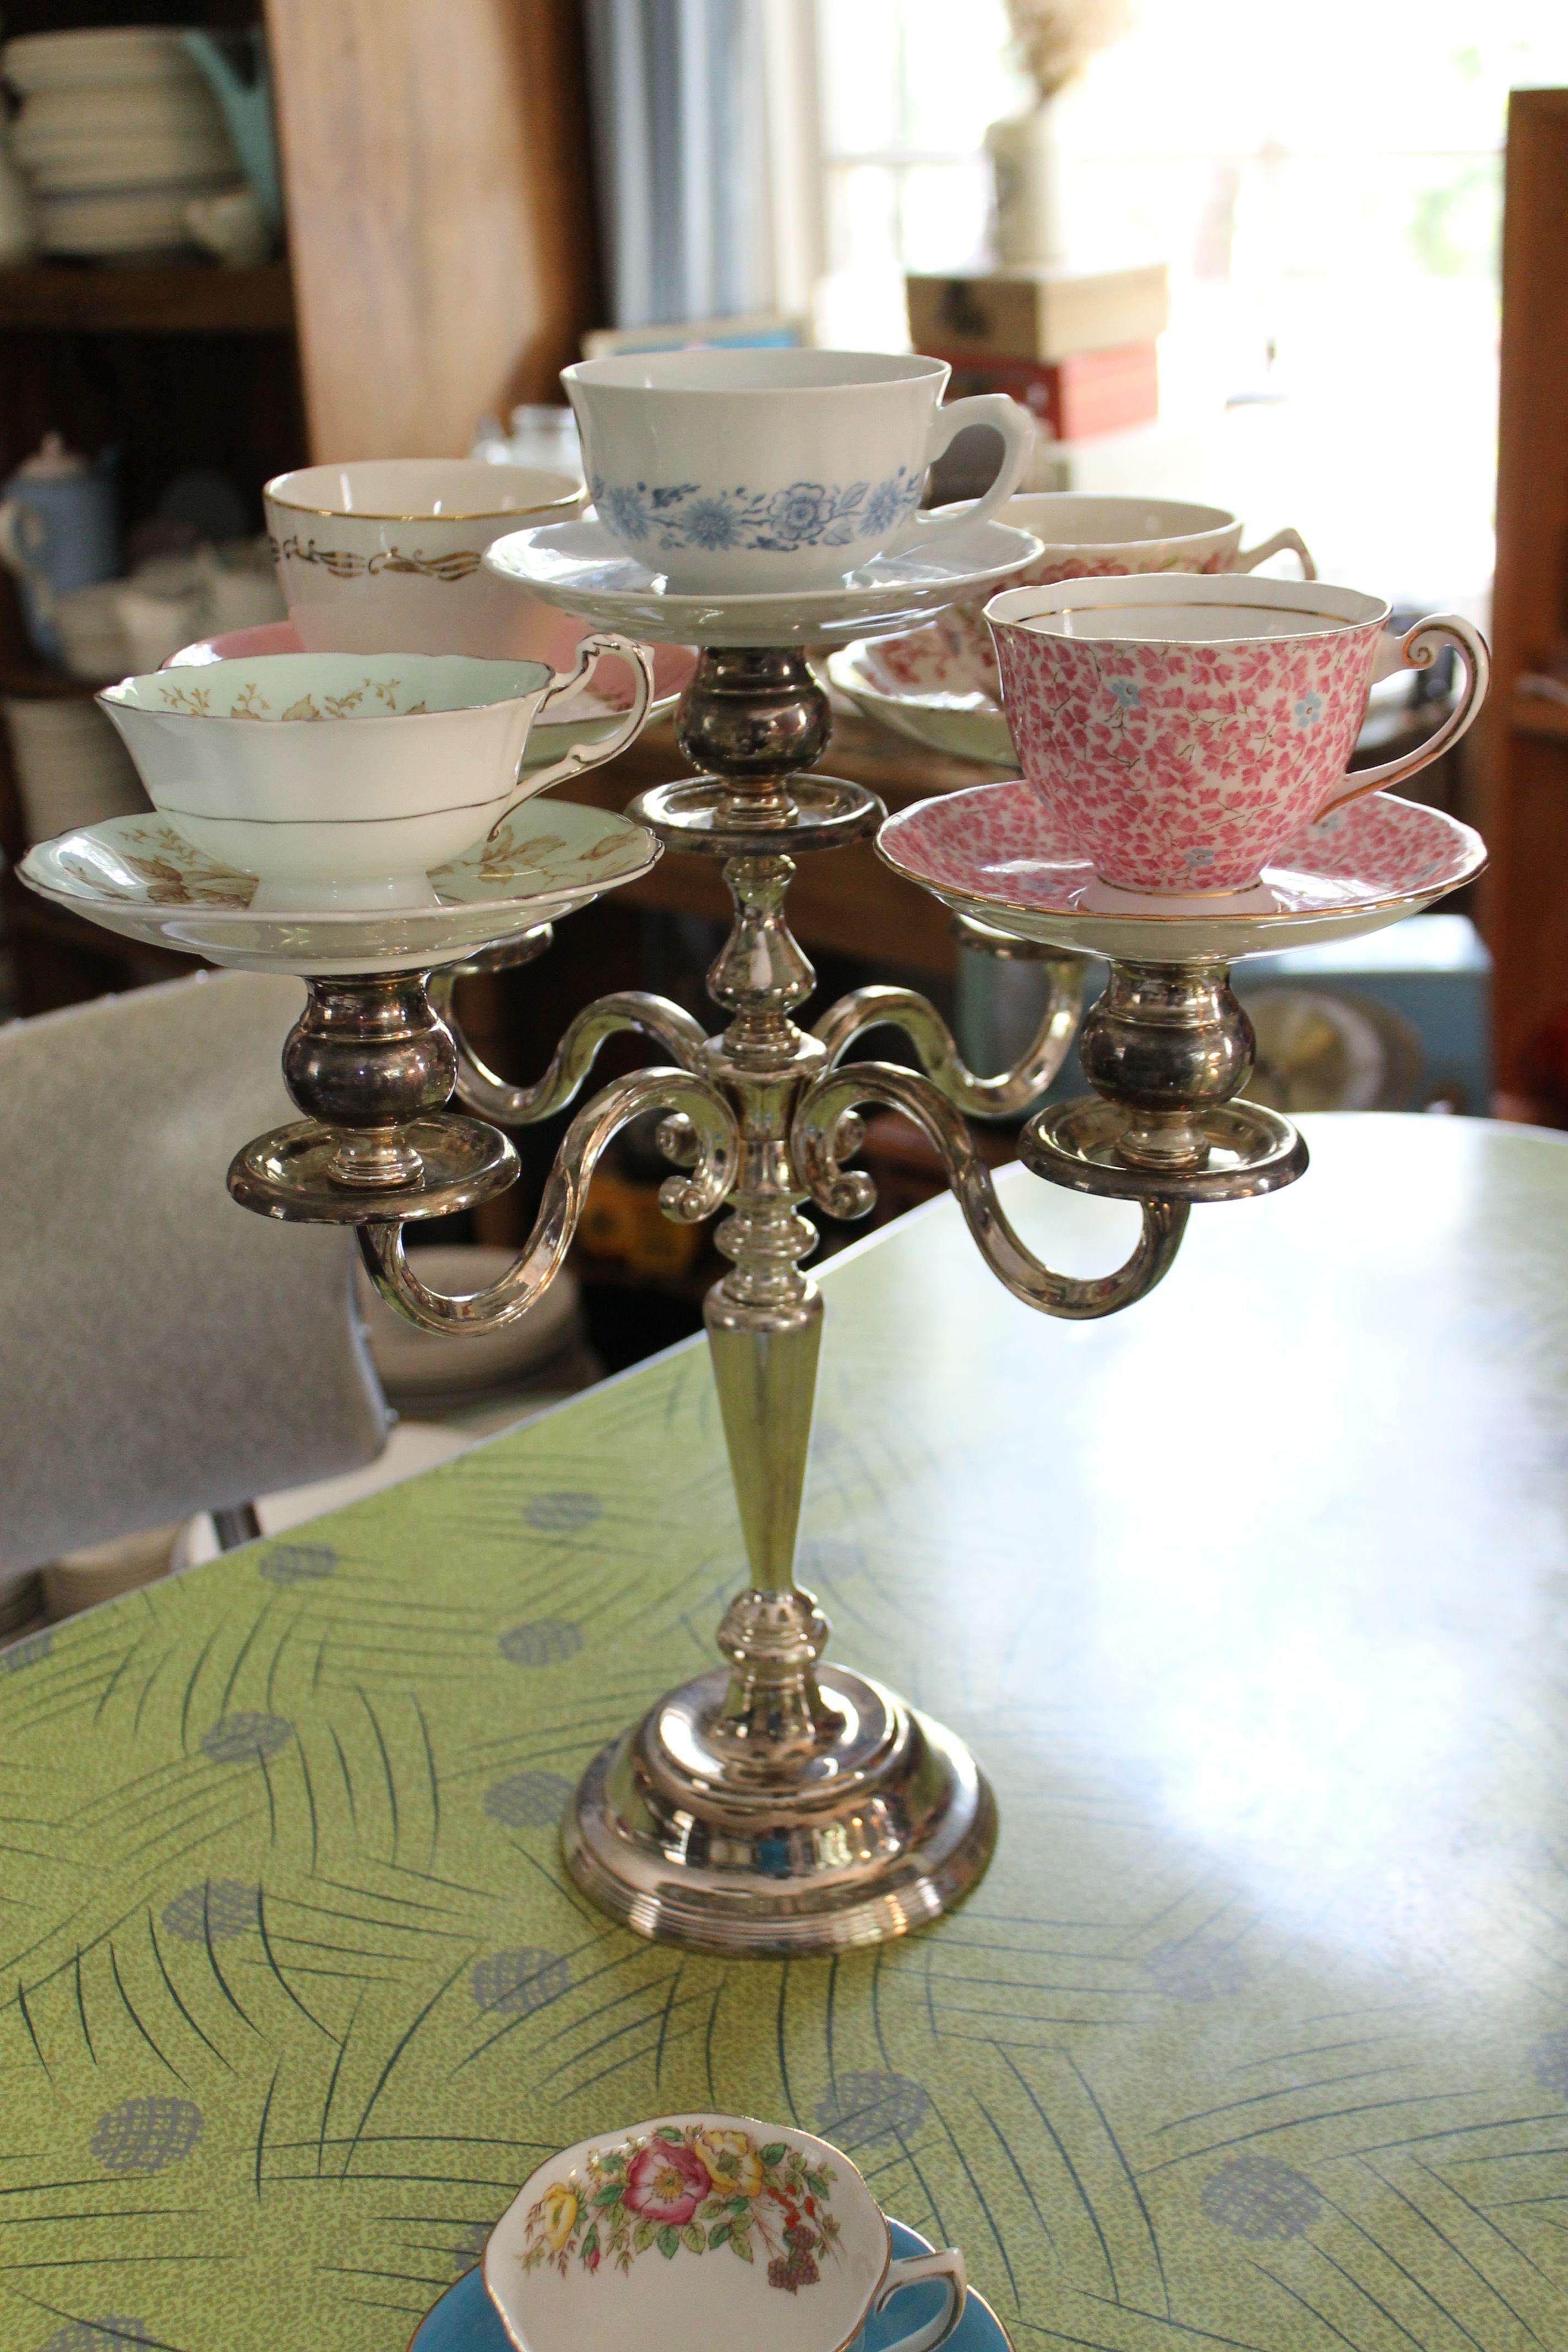 Tea Party Decor Teacups On Candelabra Southern Vintage Wedding Rental Tea Party Bridal Shower Tea Party Wedding Tea Party Garden